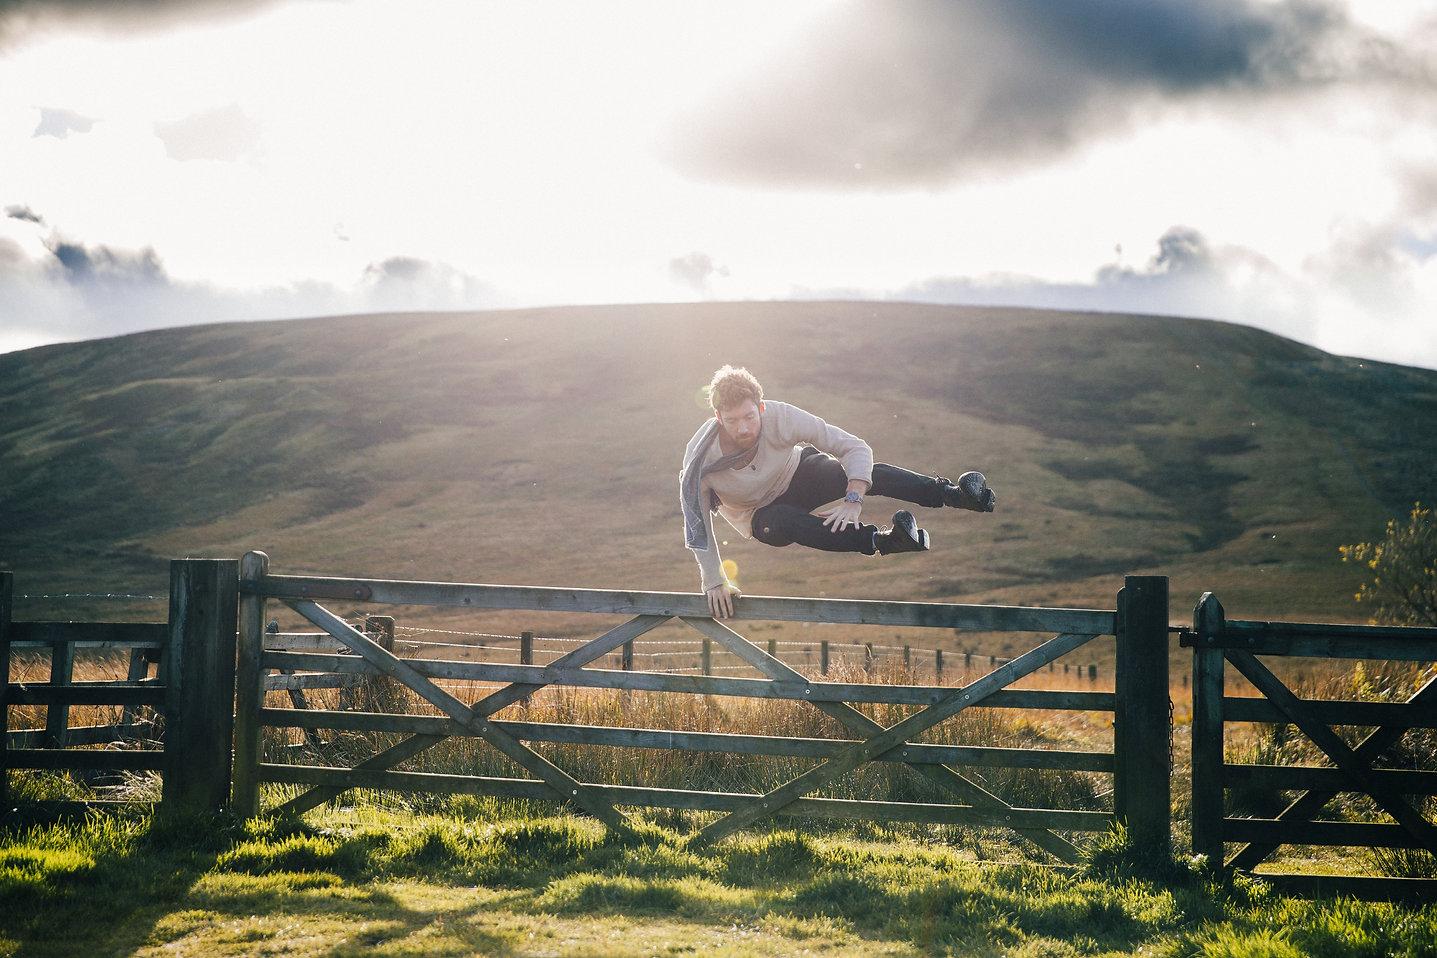 man-jumping-fence-by-field.jpg